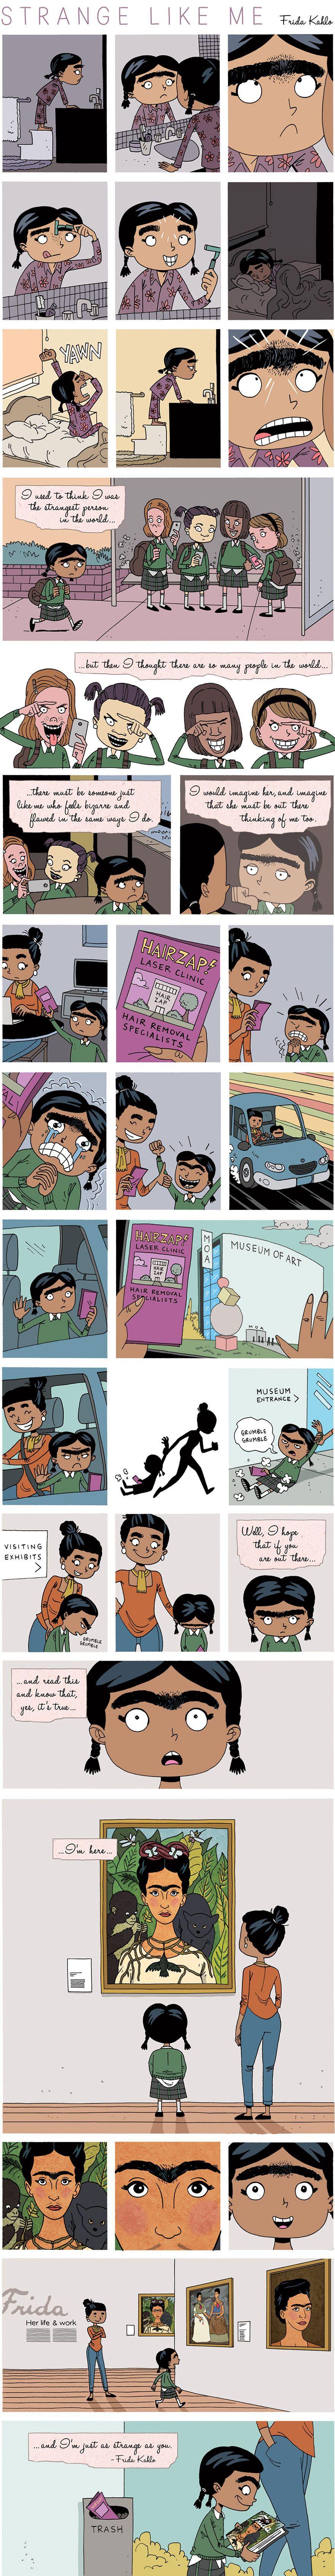 Frida Is Strange Like Me: I Turn Inspirational Quotes Into Comics